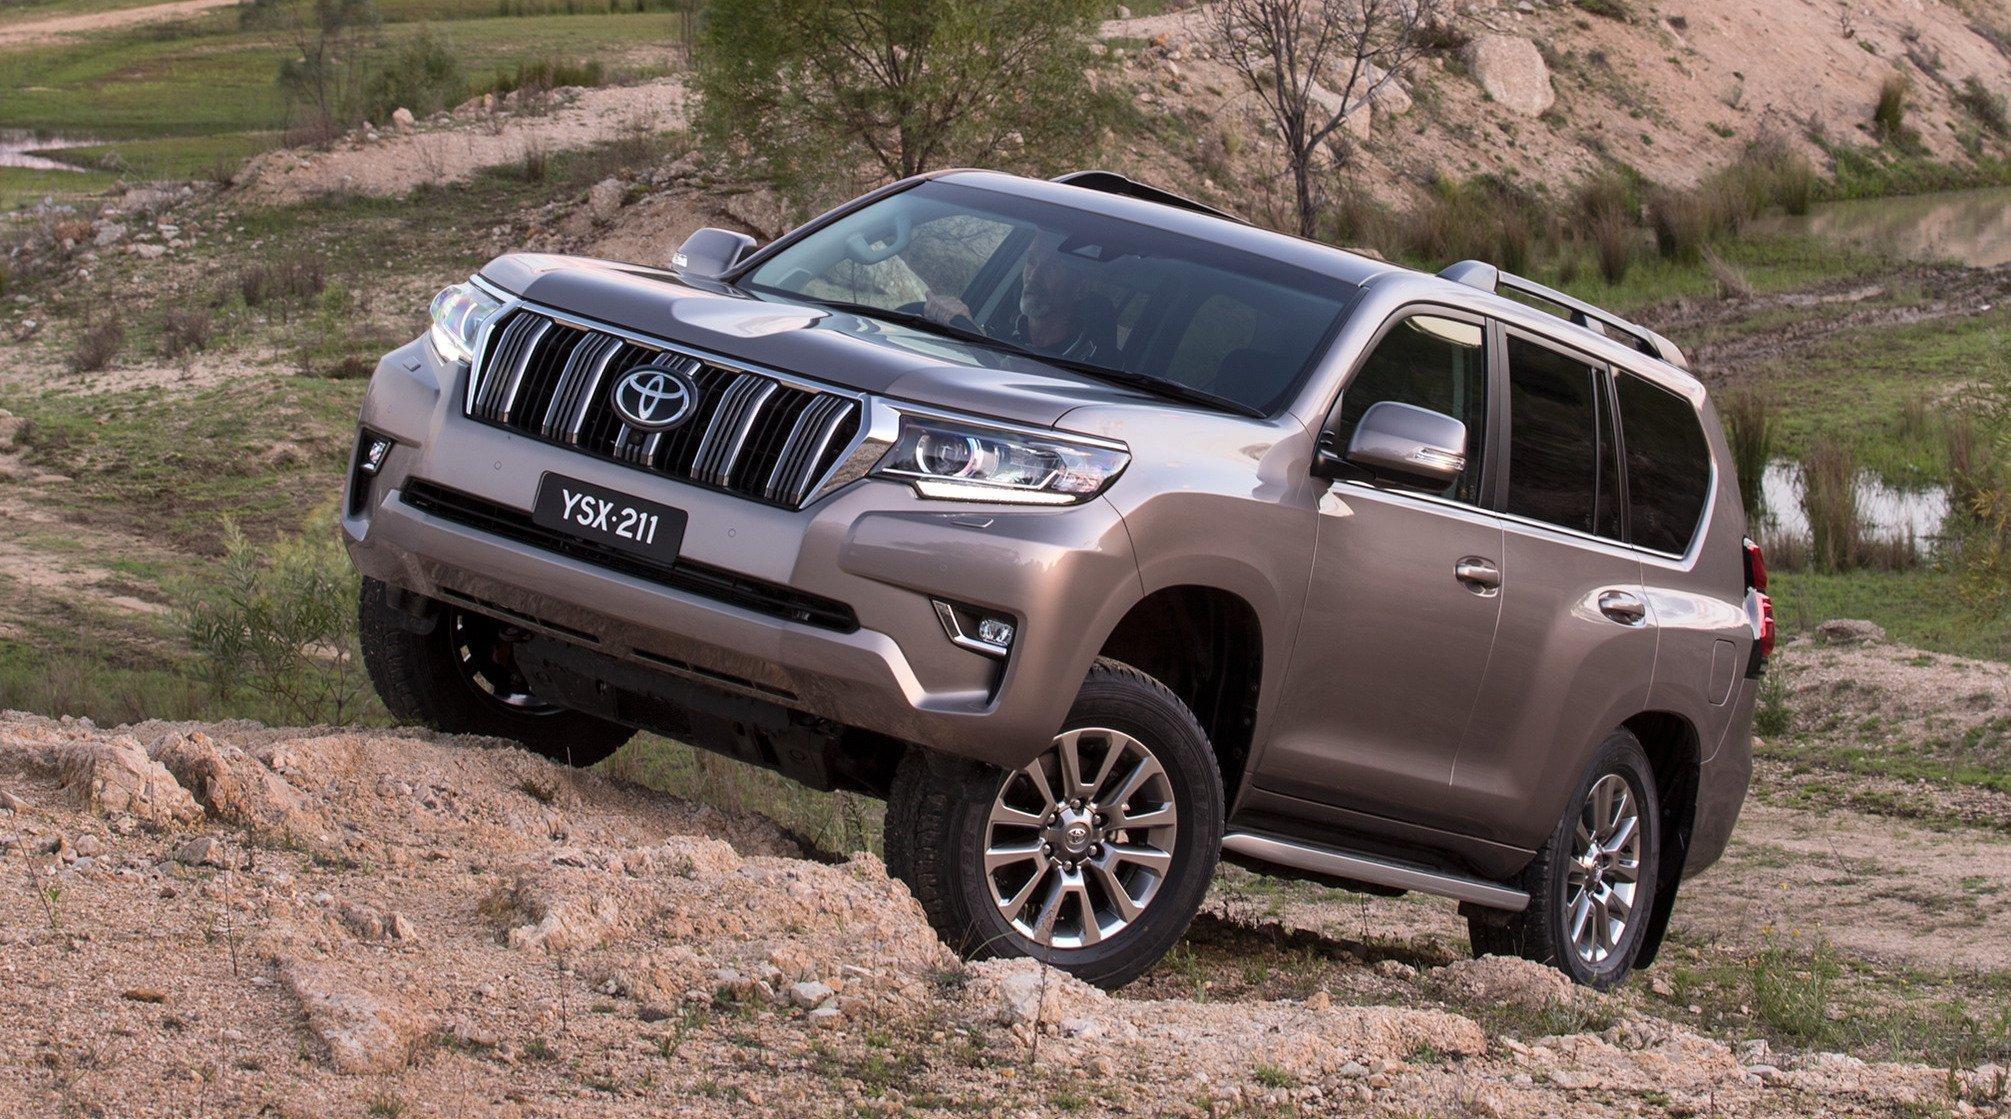 2018 Toyota LandCruiser Prado pricing and specs - Photos ...